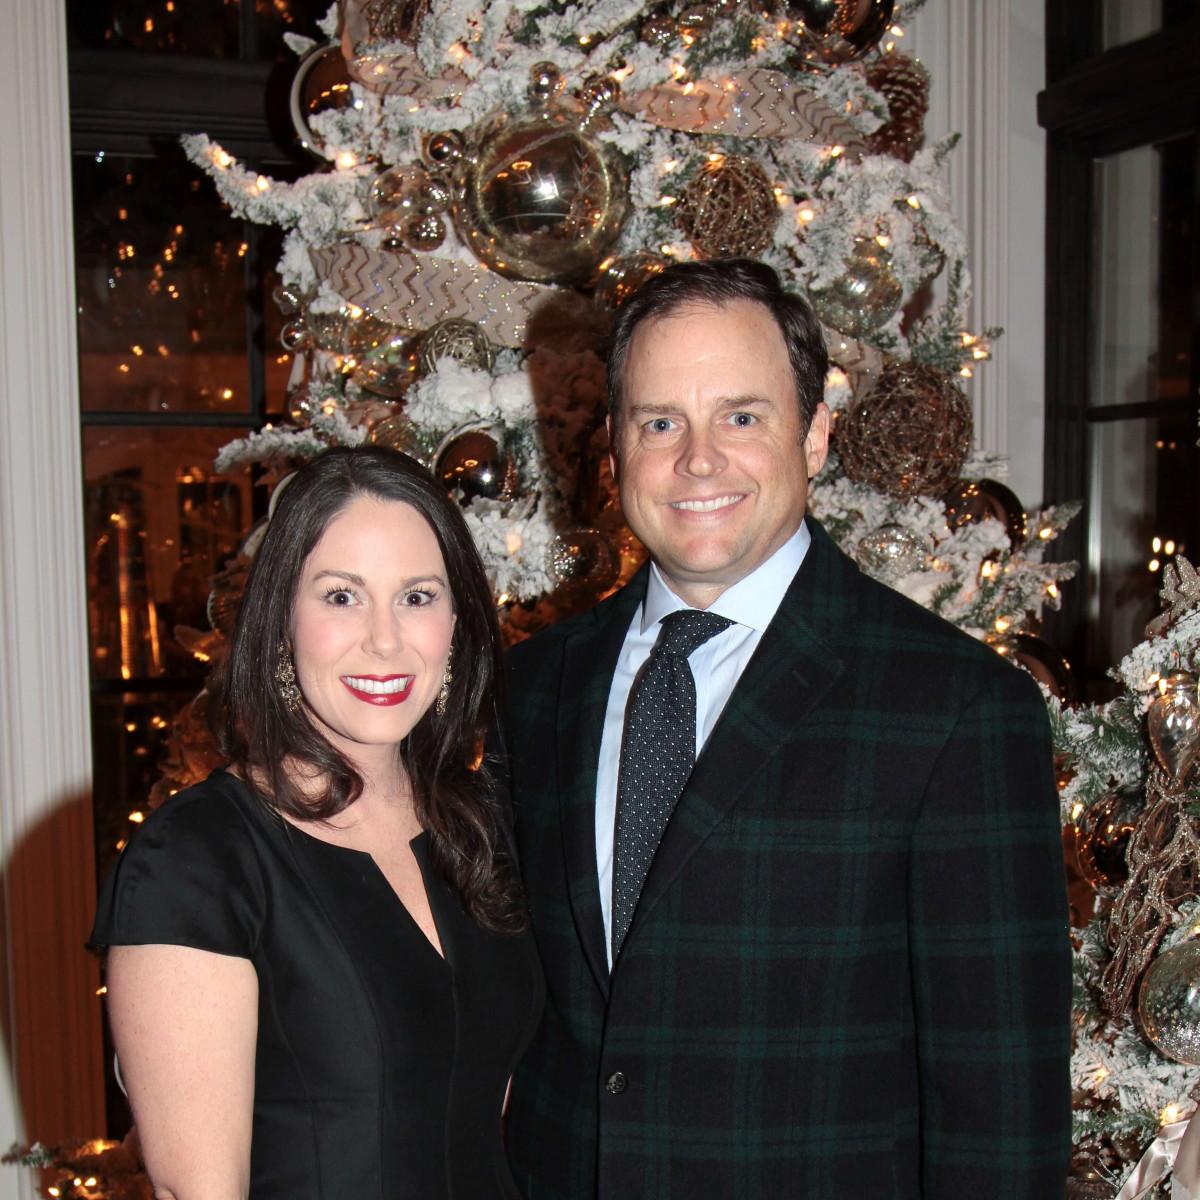 MD Anderson Santa's Elves party, Kristin Hamilton, Hugh Hamilton